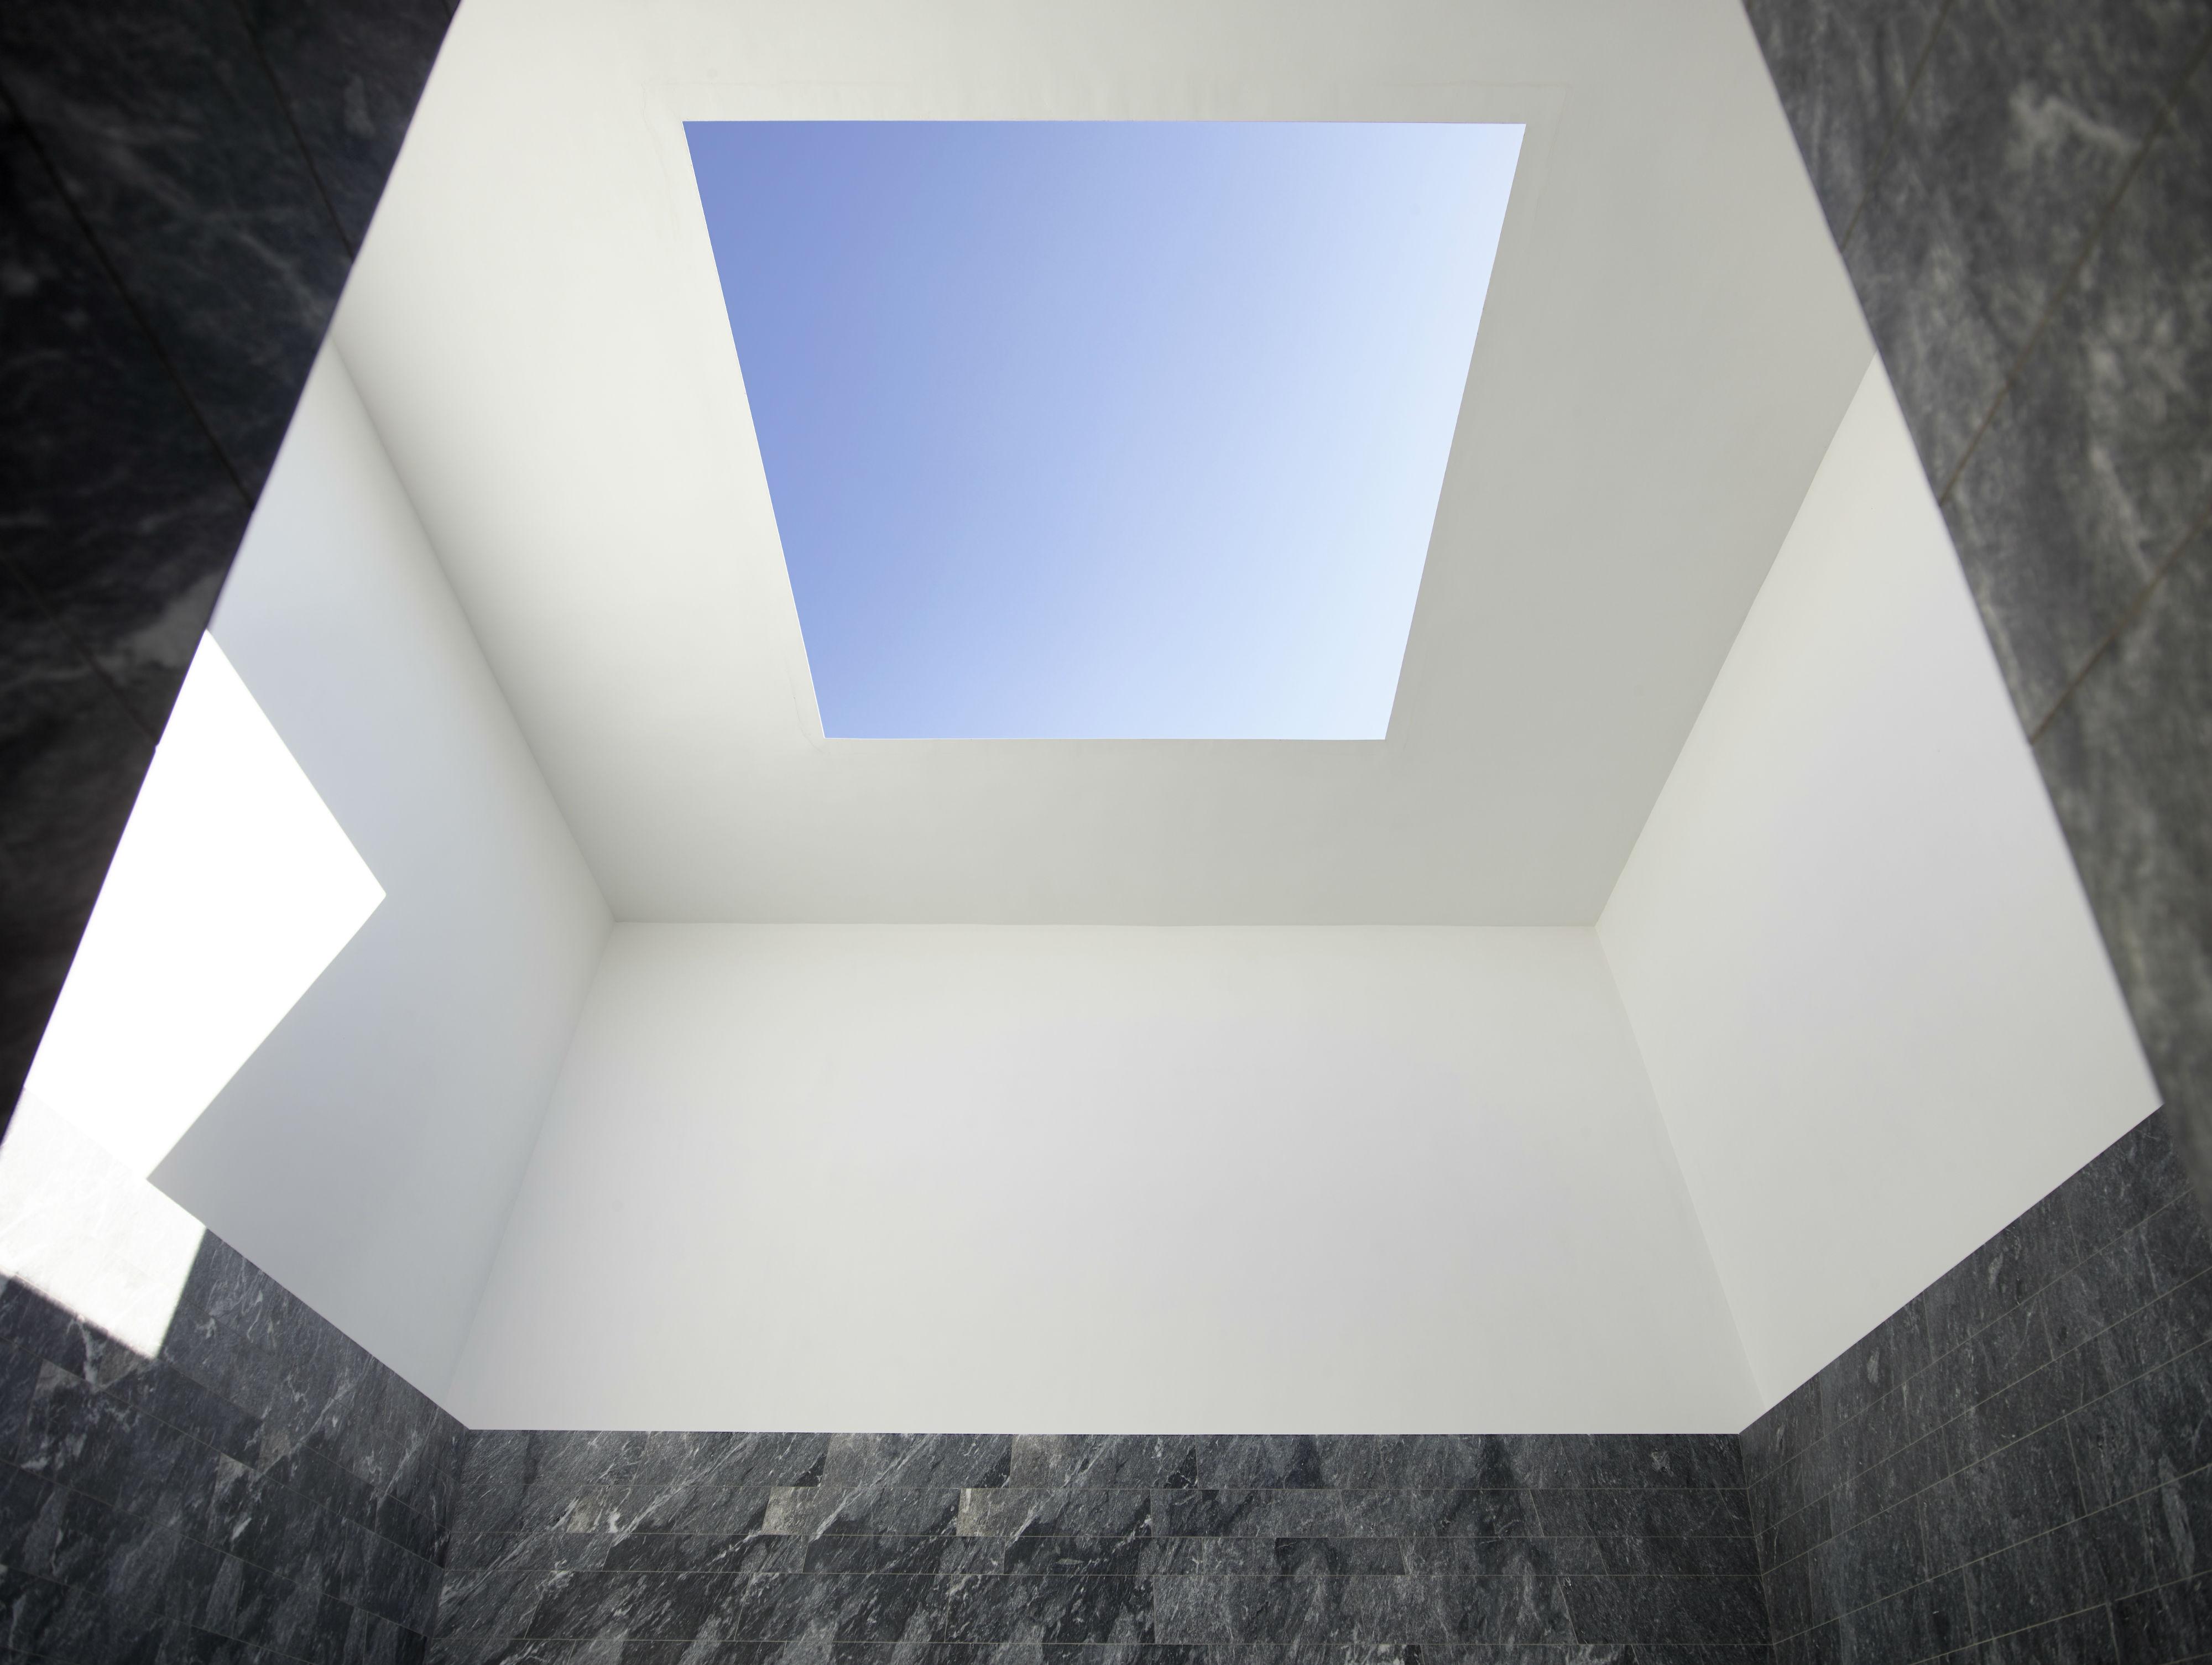 Artist James Turrell Creates Sky Plain For A Peaceful Life